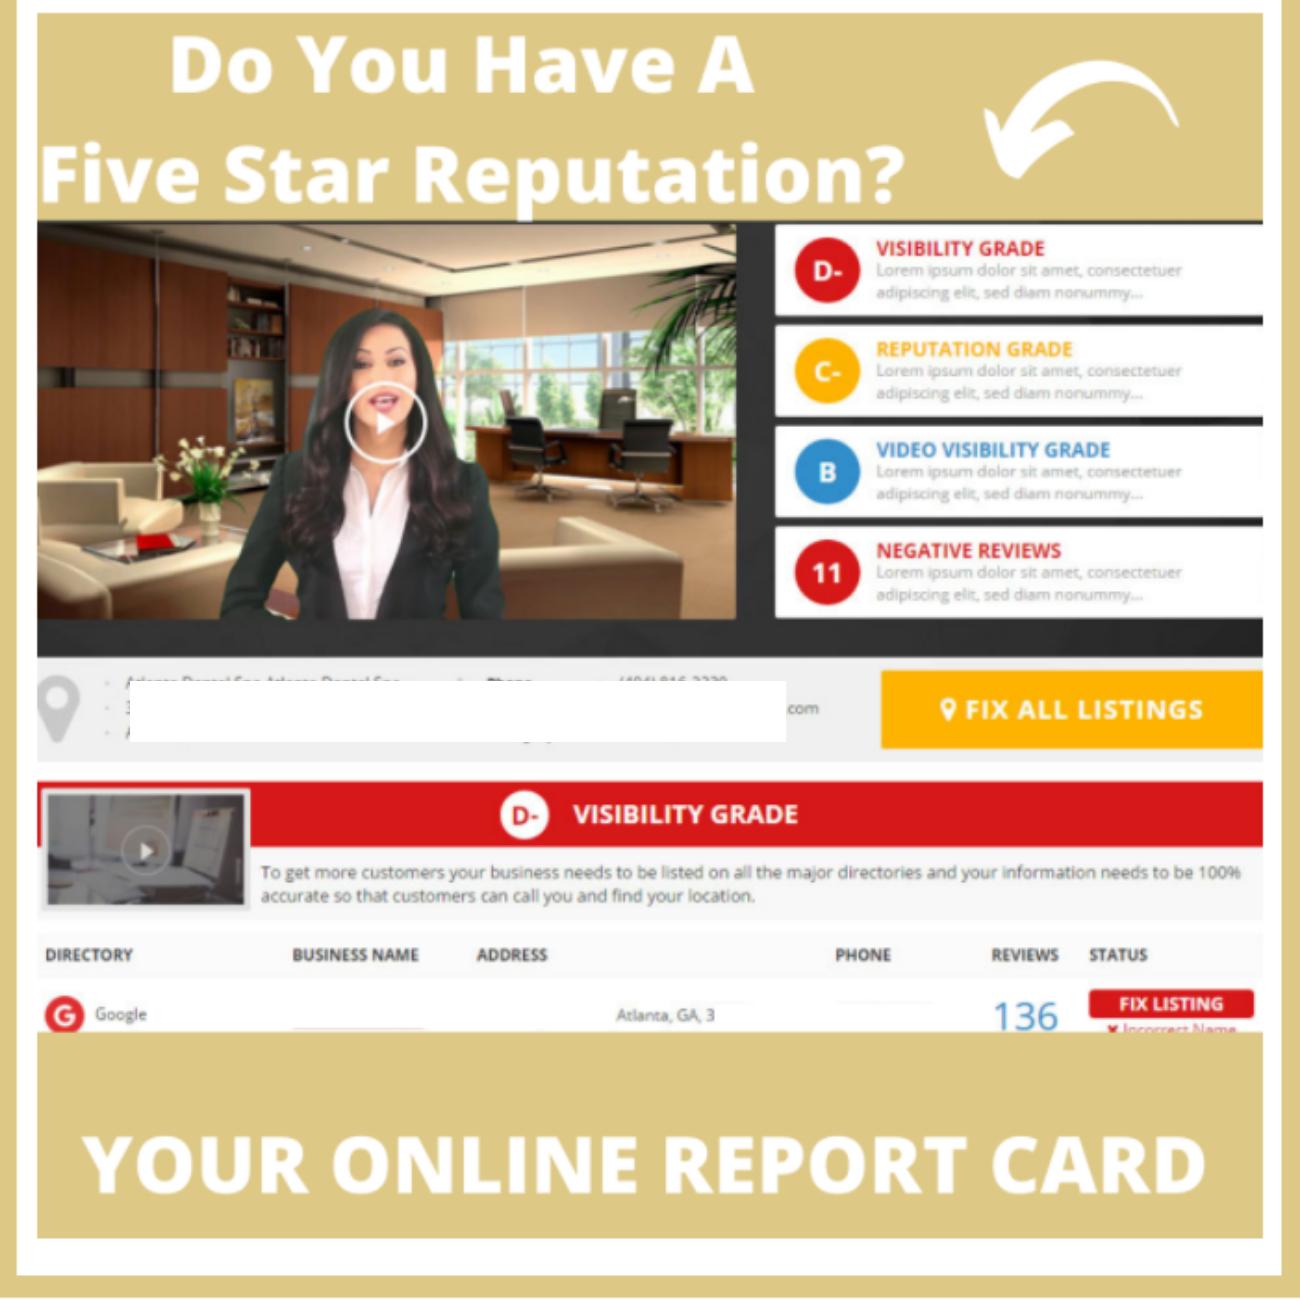 THE FIVE STAR REPUTATION CLUB